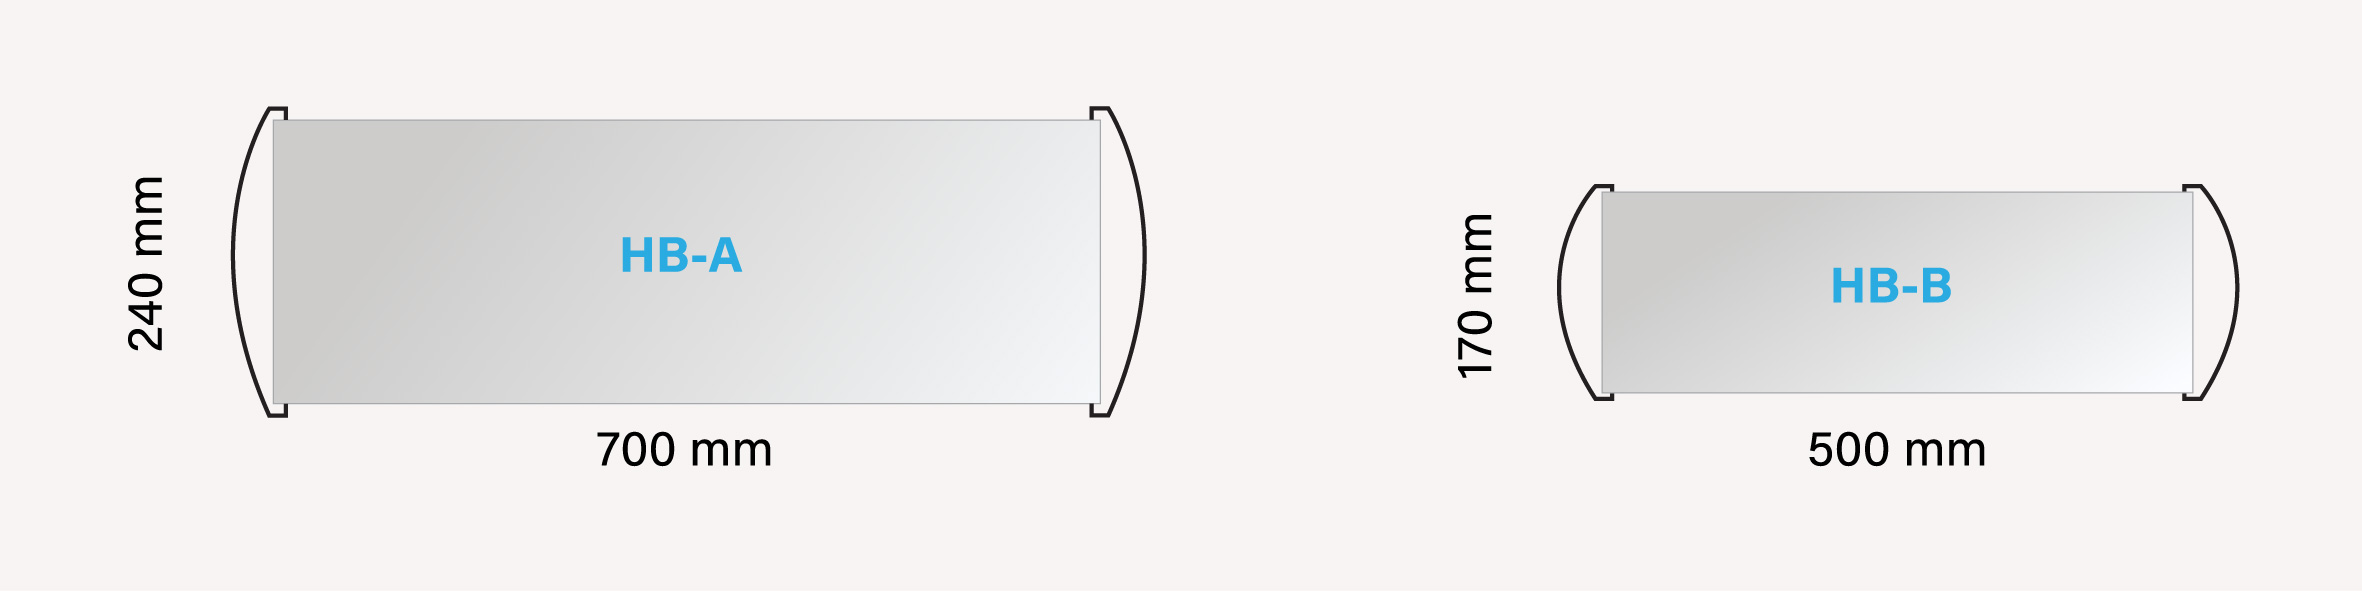 Design - Handheld Banner